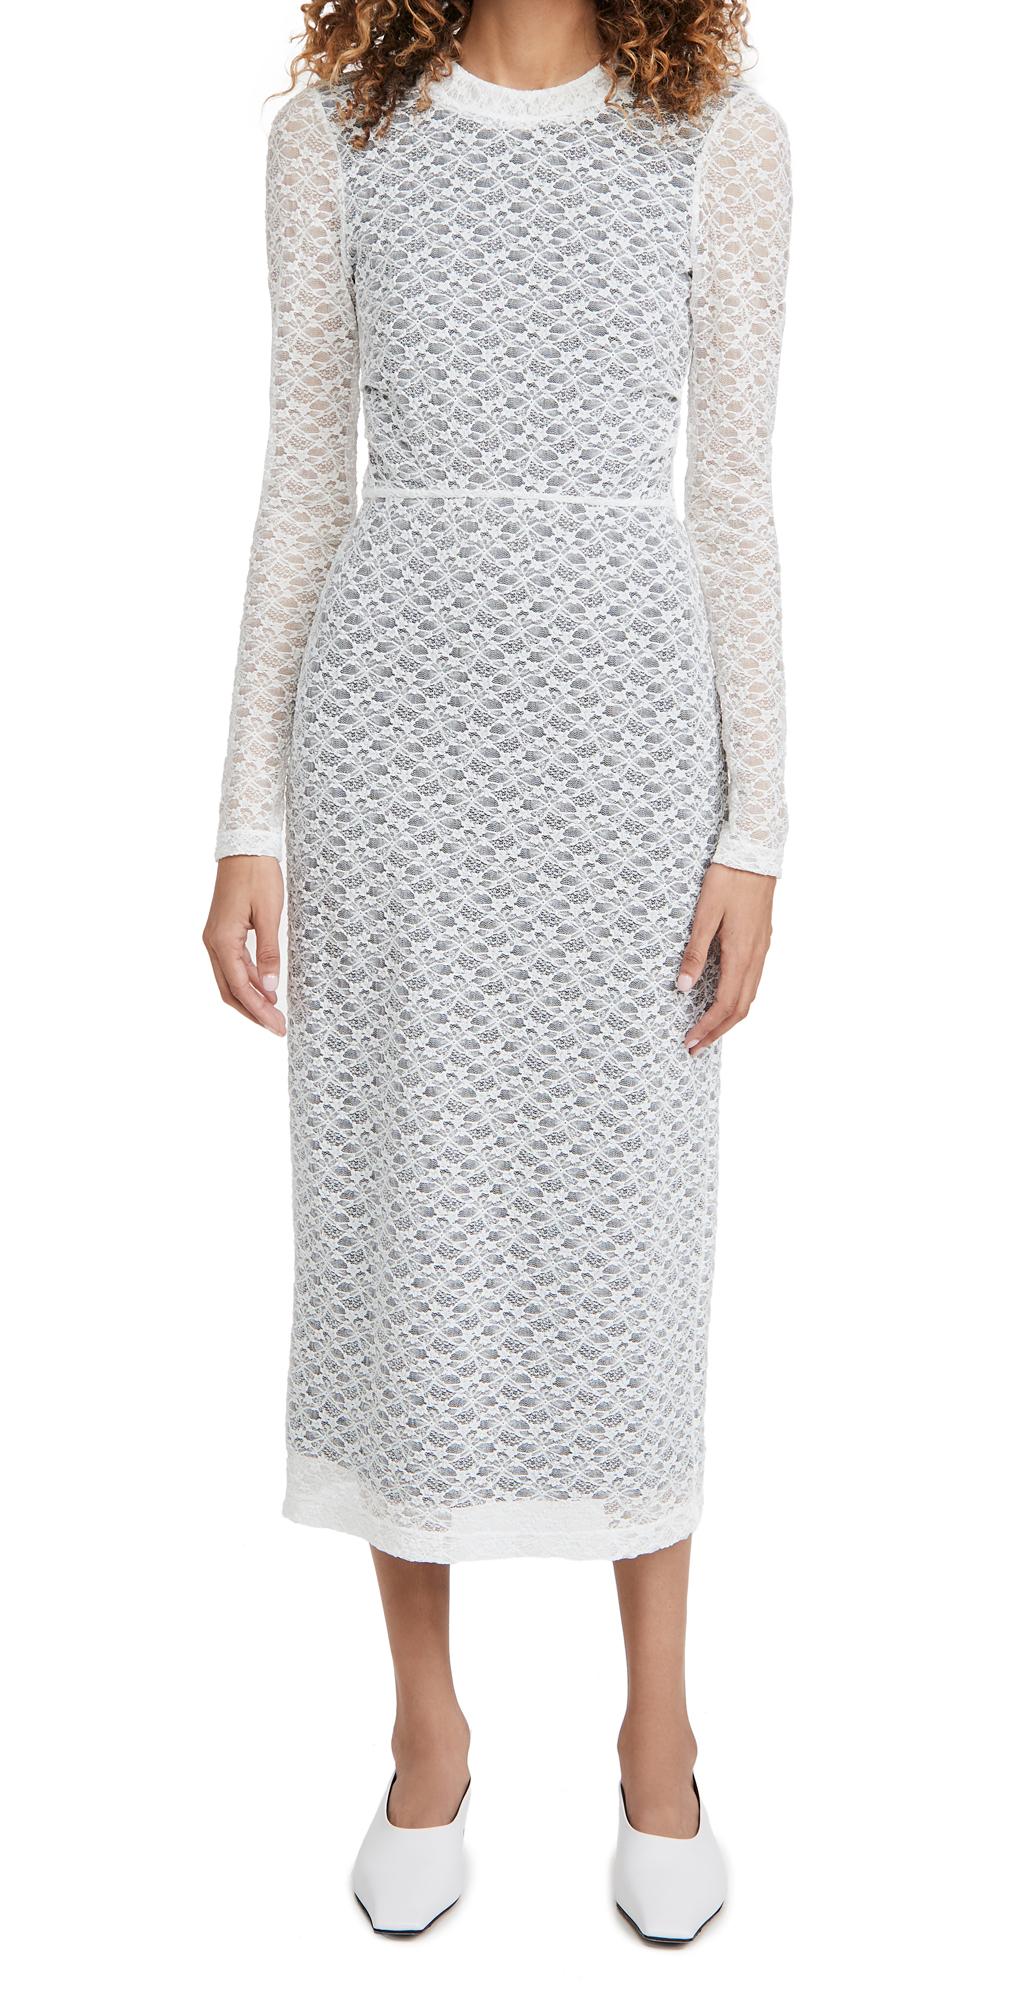 Rachel Comey Amarone Dress